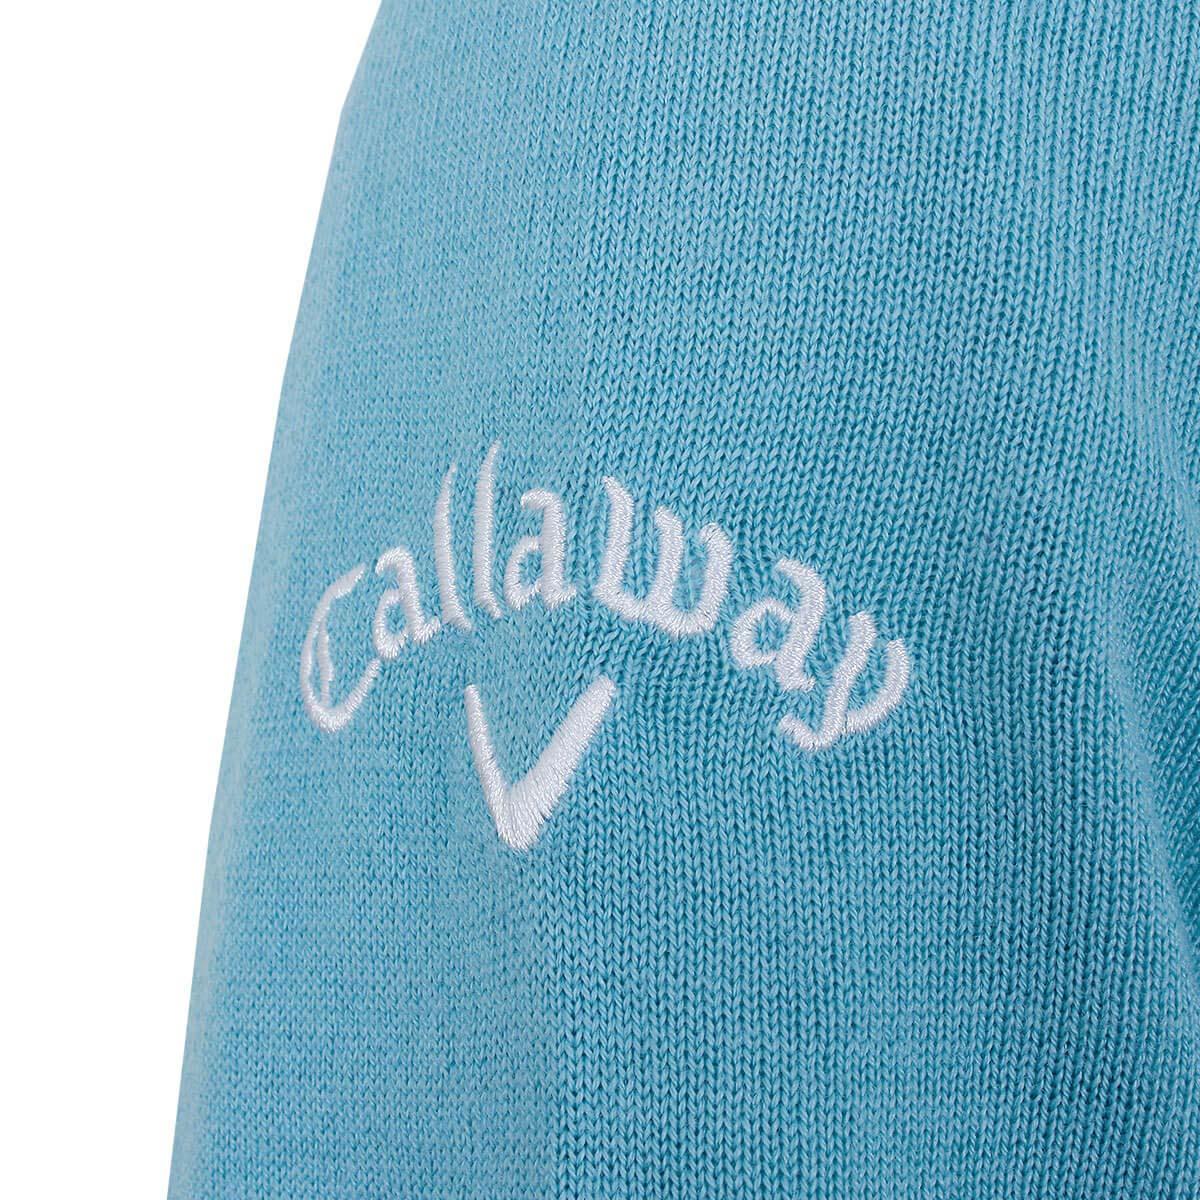 Callaway-Golf-Mens-1-4-Zip-Mock-Merino-Windproof-Sweater-Pullover-43-OFF-RRP thumbnail 7